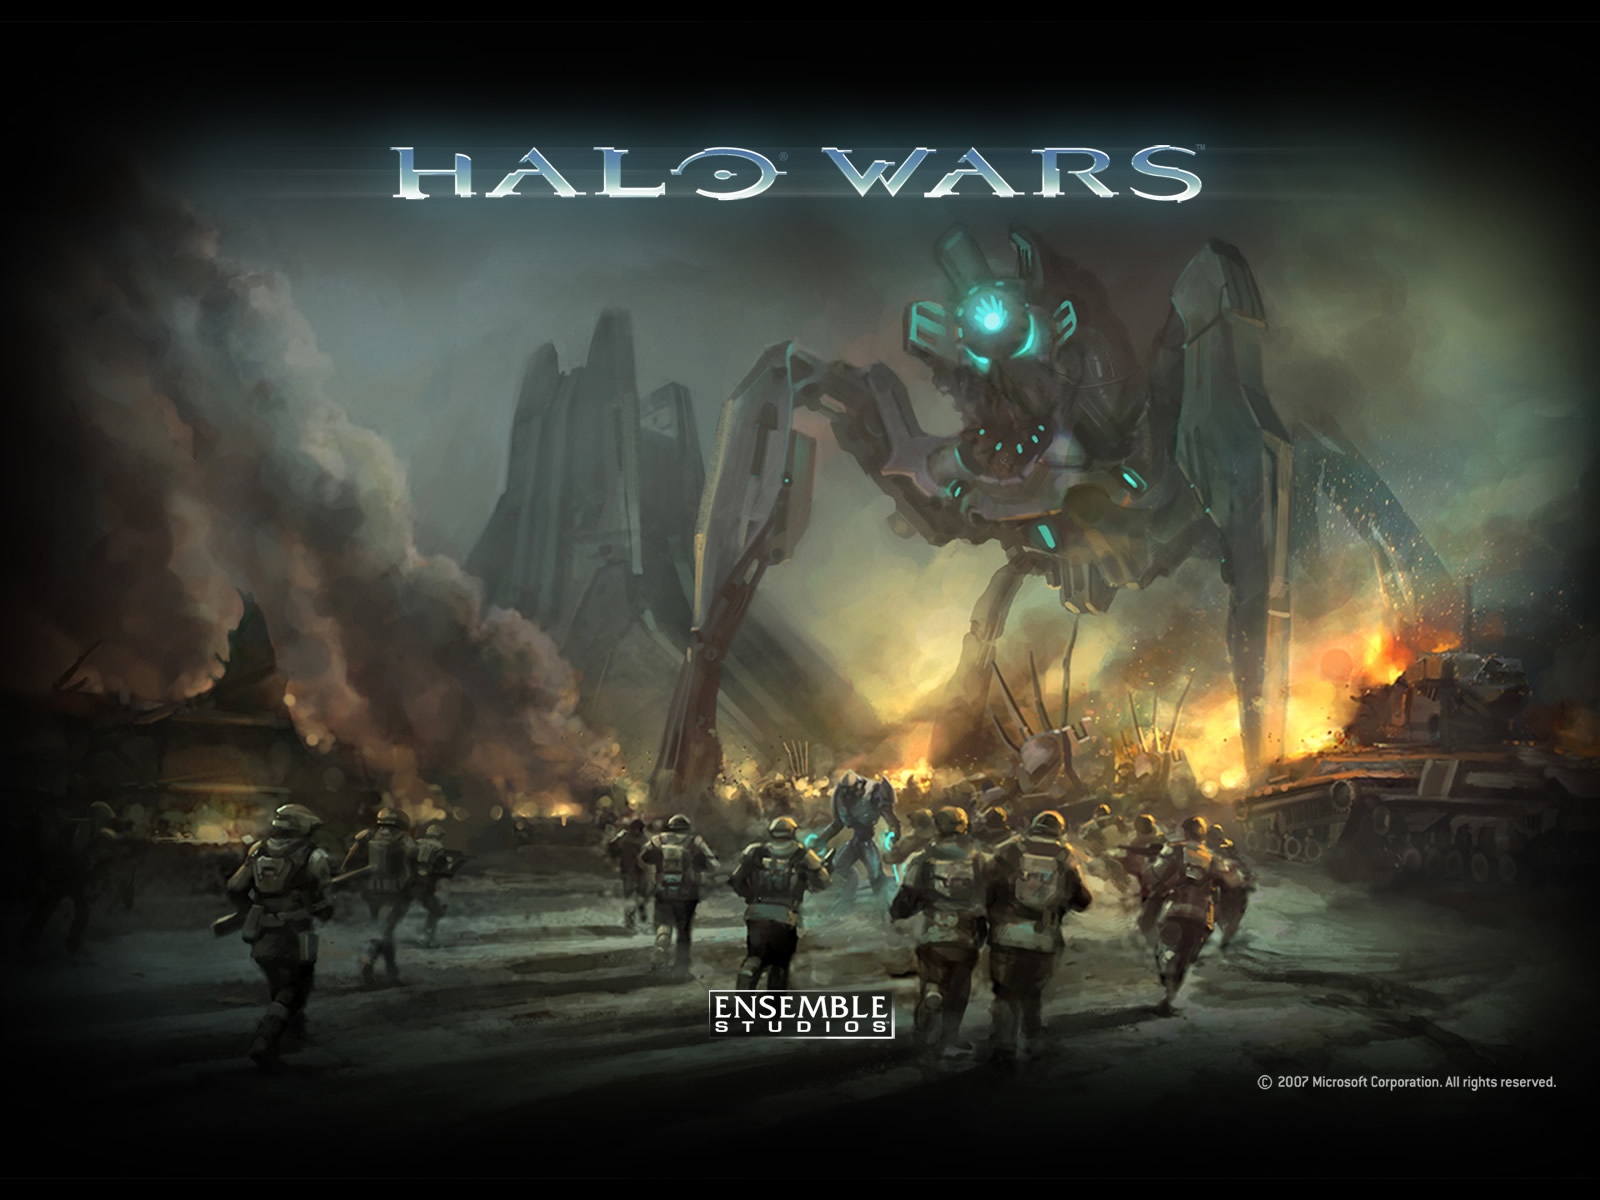 http://2.bp.blogspot.com/--loWNB9PifY/UGVYd5d_fRI/AAAAAAAAKXk/OoWpBuMPMyM/s1600/halo-wars-game.jpeg